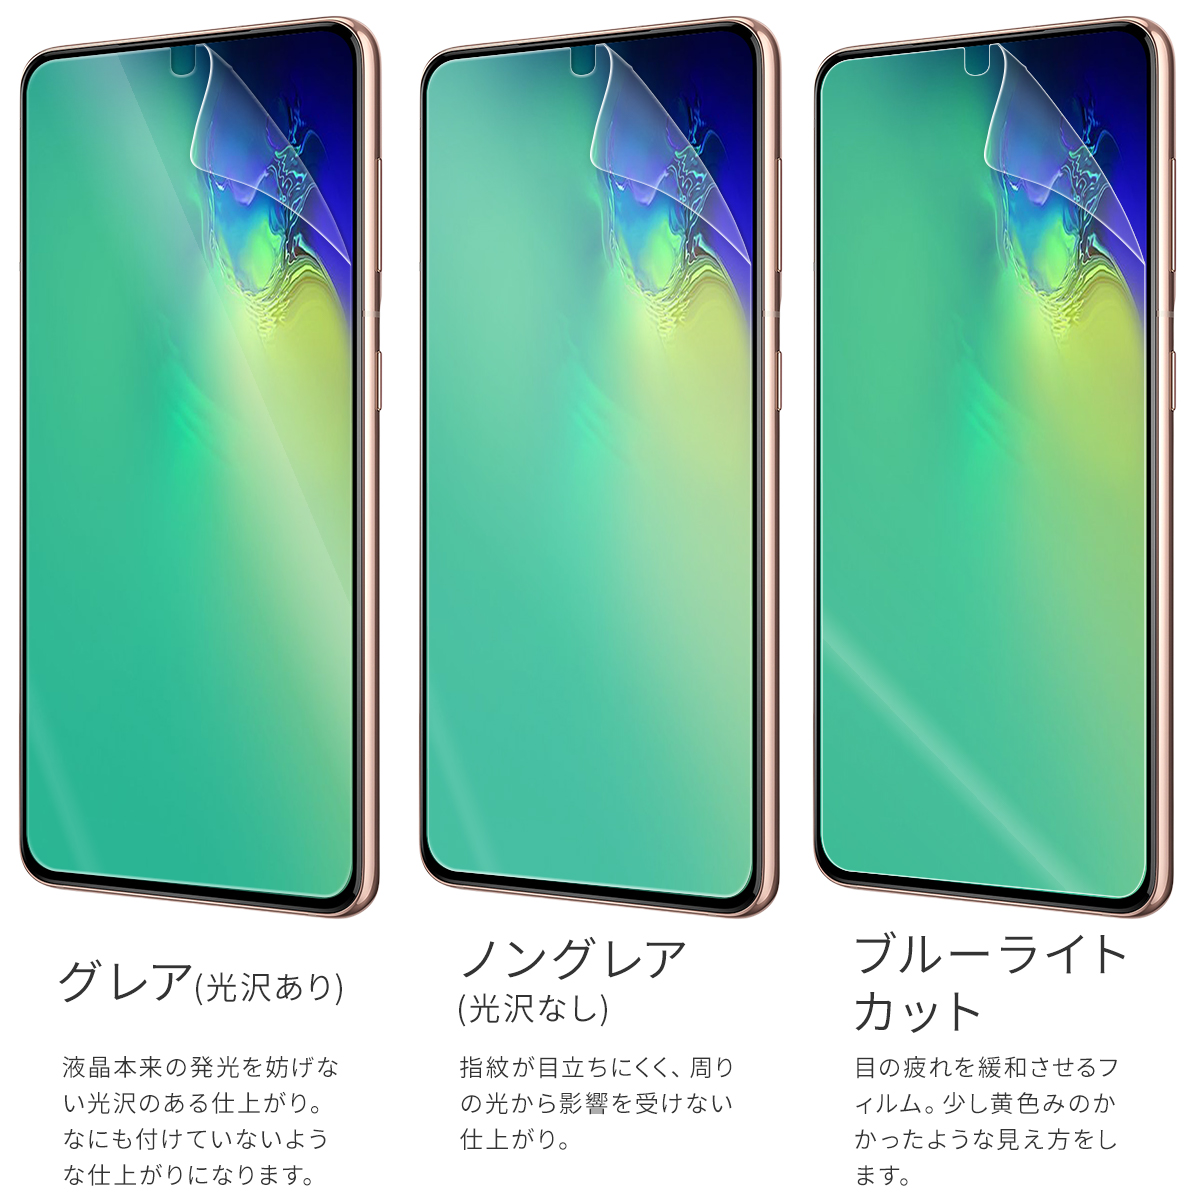 Galaxy S21 5G Galaxy S21+ 5G Galaxy S21 Ultra 液晶保護フィルム